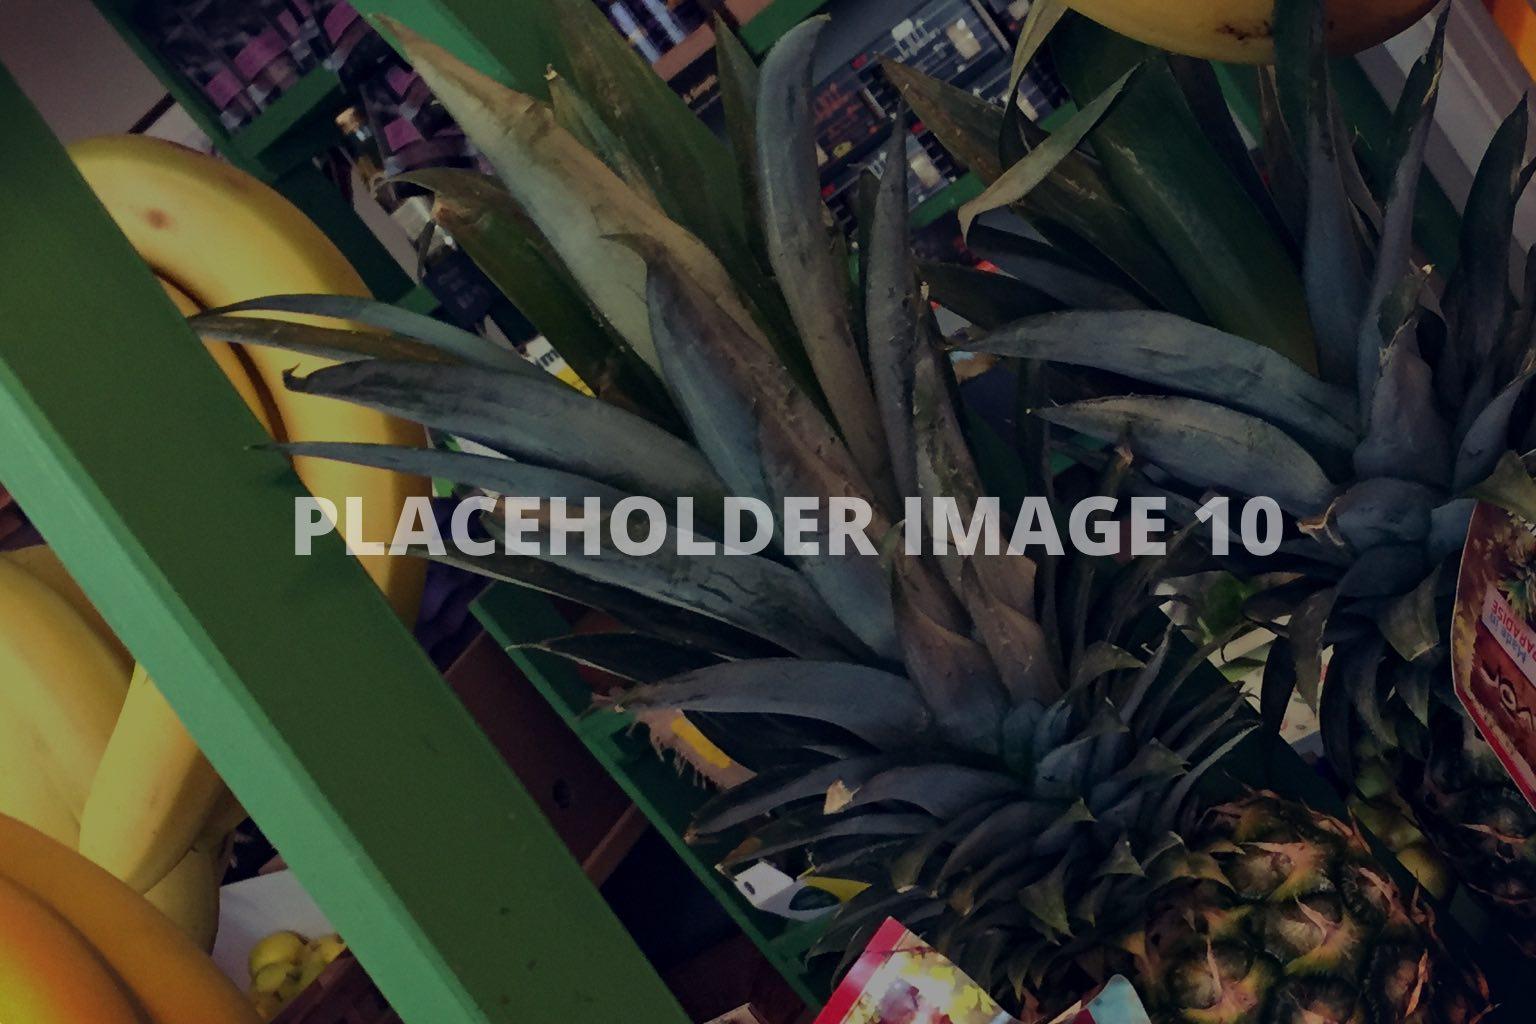 core/profiles/demo_umami/modules/demo_umami_content/default_content/images/pineapple-placeholder-10.jpg